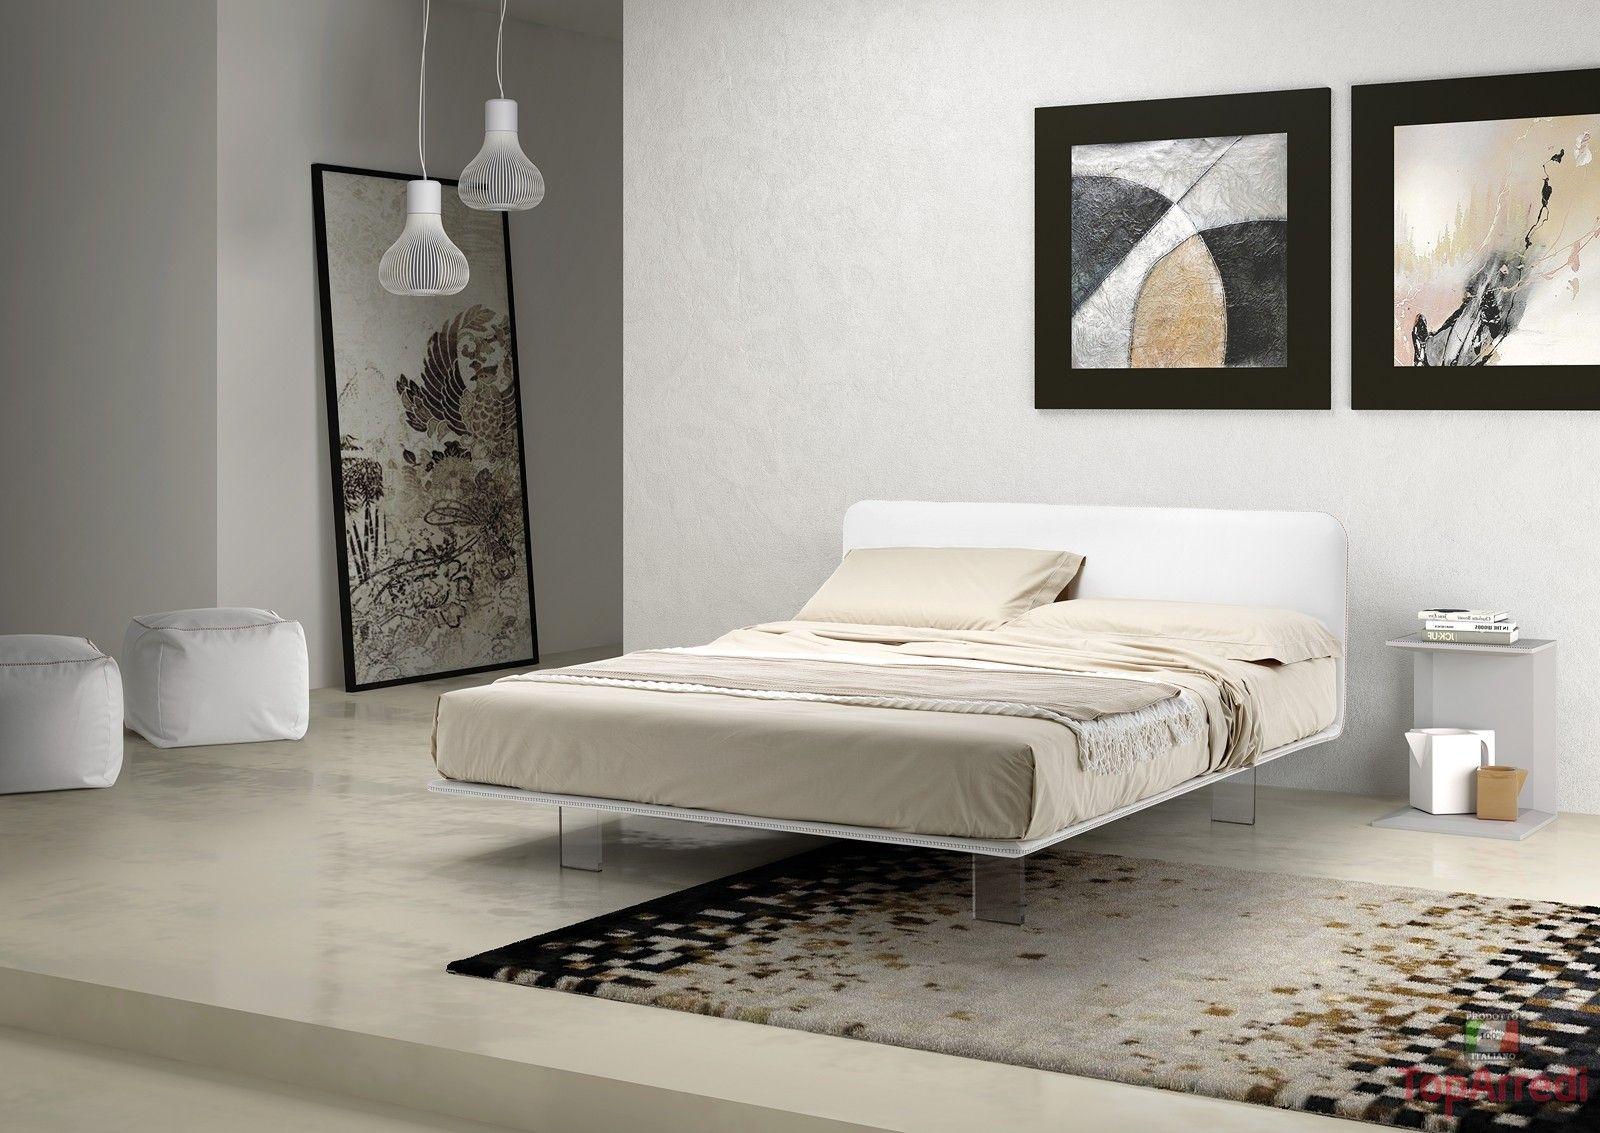 New for ikea childrens in 2011 ikea fans the ikea fan community. Letti Ikea Una Piazza E Mezzo Prezzi Letti Ikea Una Piazza E Masculine Home Decor Bed Master Bedroom Paint